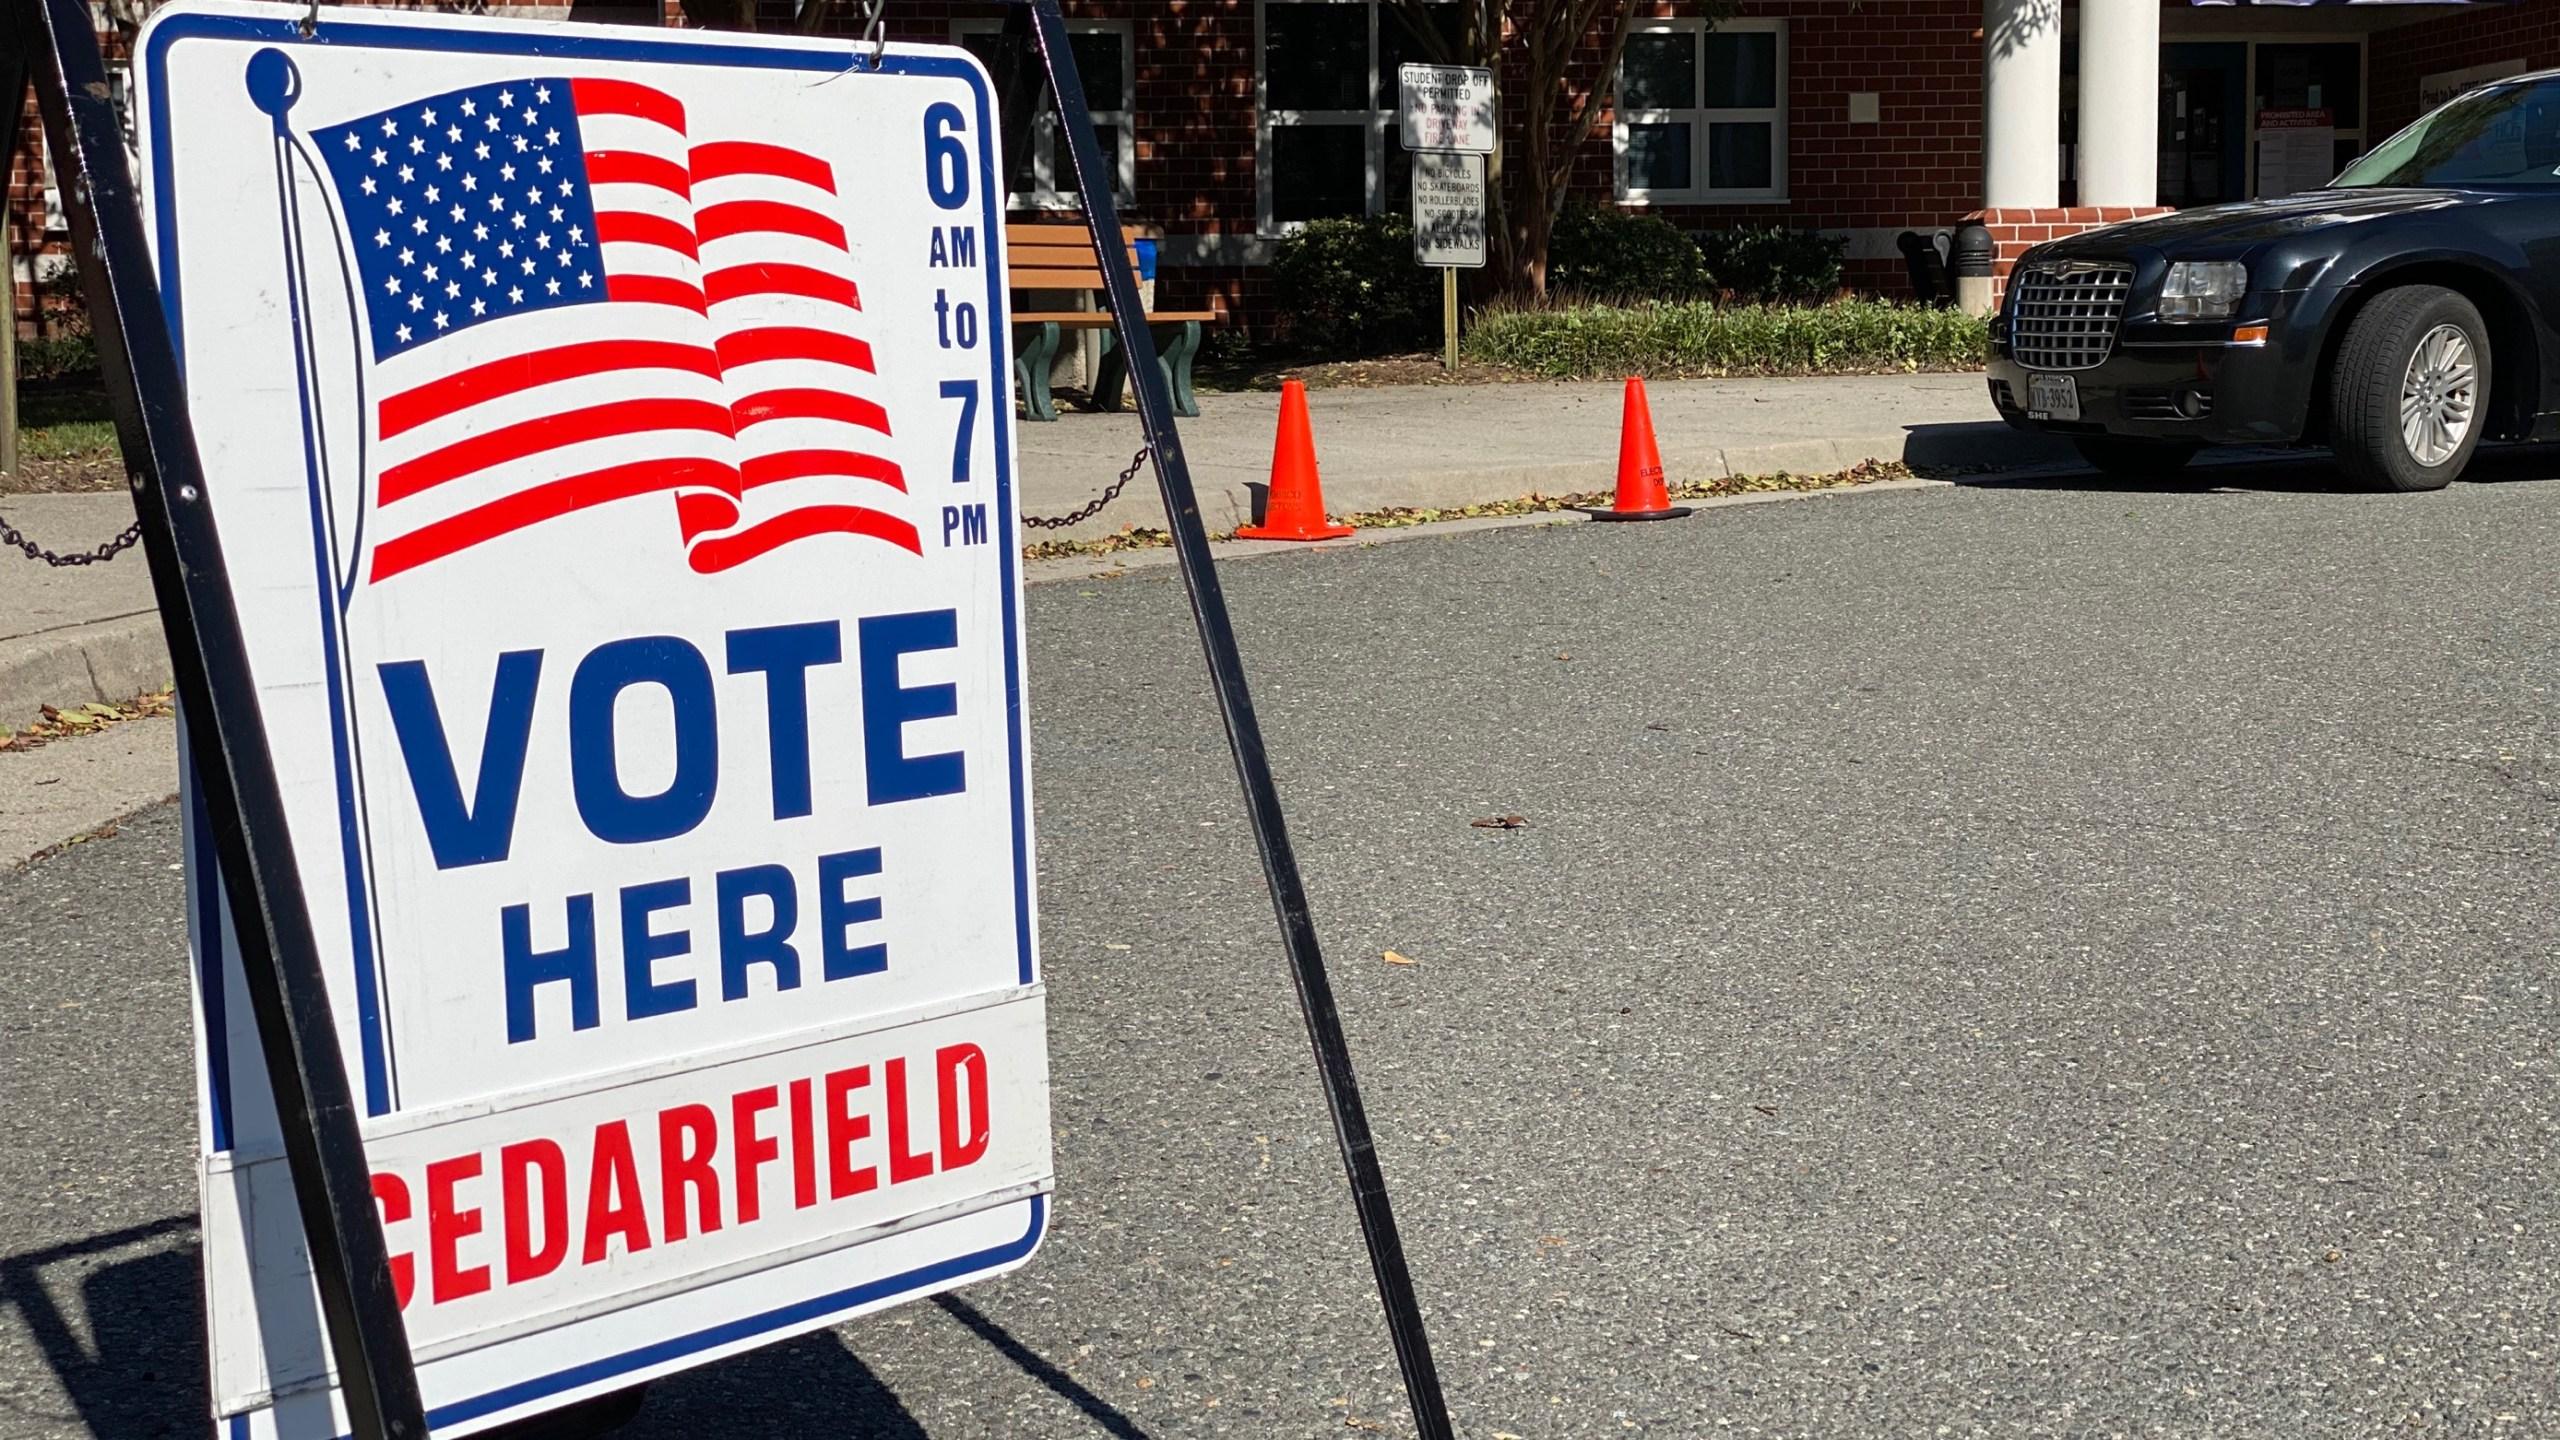 Sign at the Cedarafield polling precinct